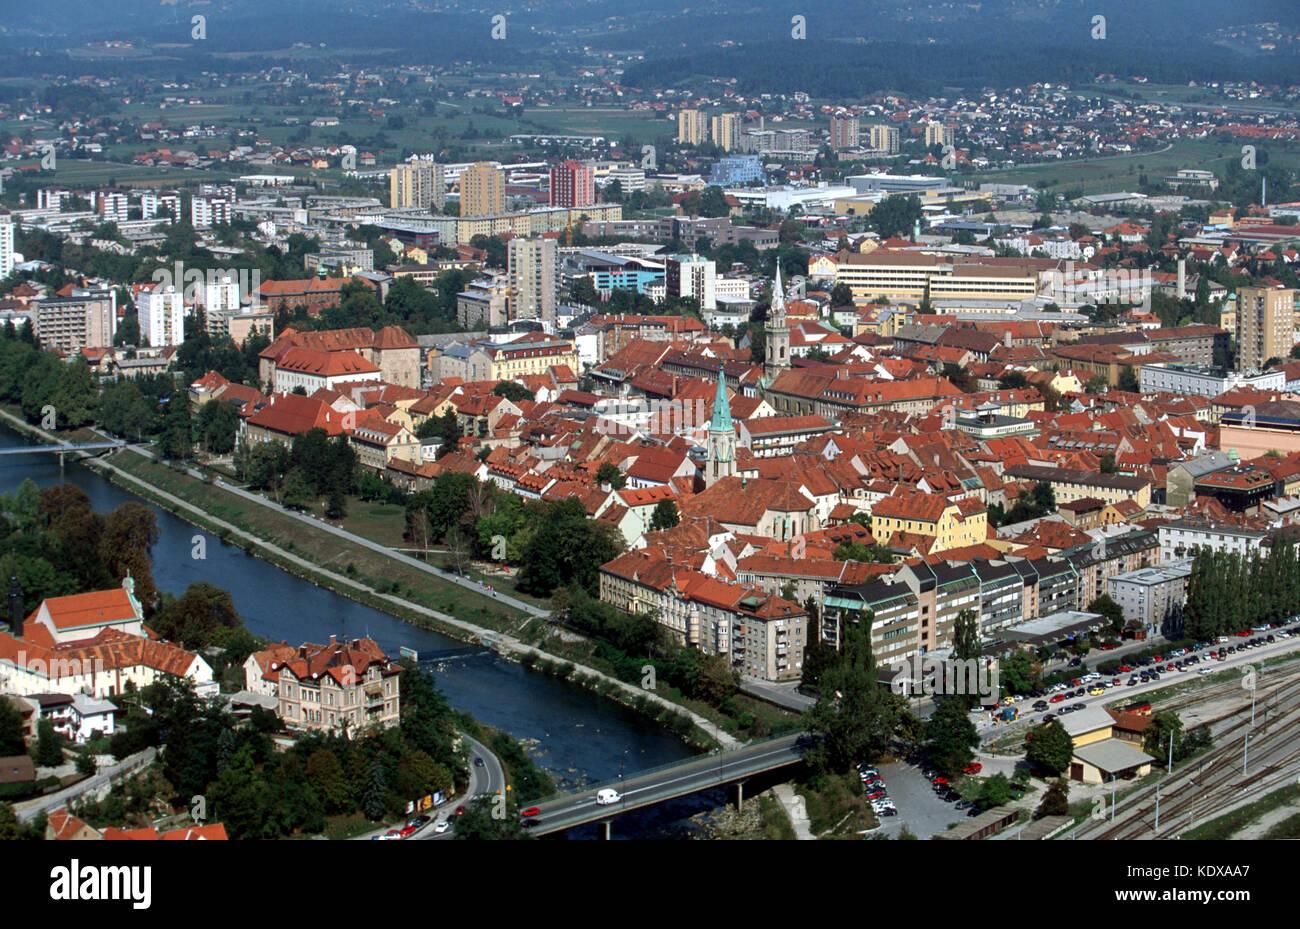 Slowenien, Celje, Blick von der Burg Stari Grad - Stock Image